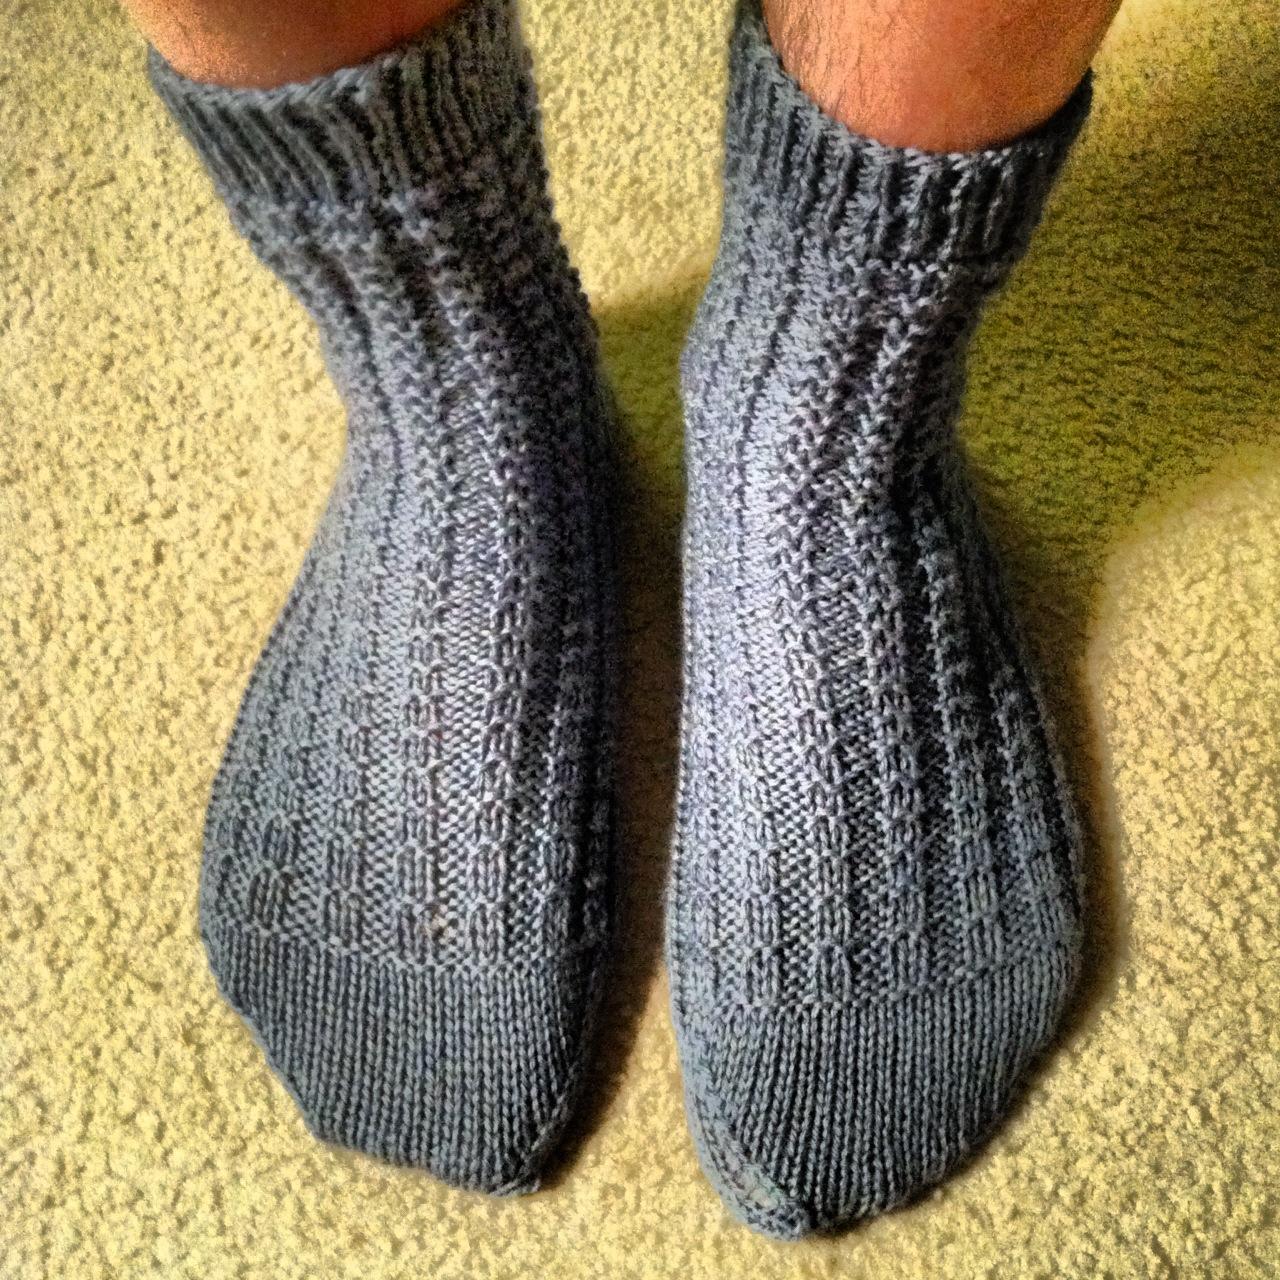 My first written sock pattern, (Mostly) Ridge Rib Socks, available  FREE.